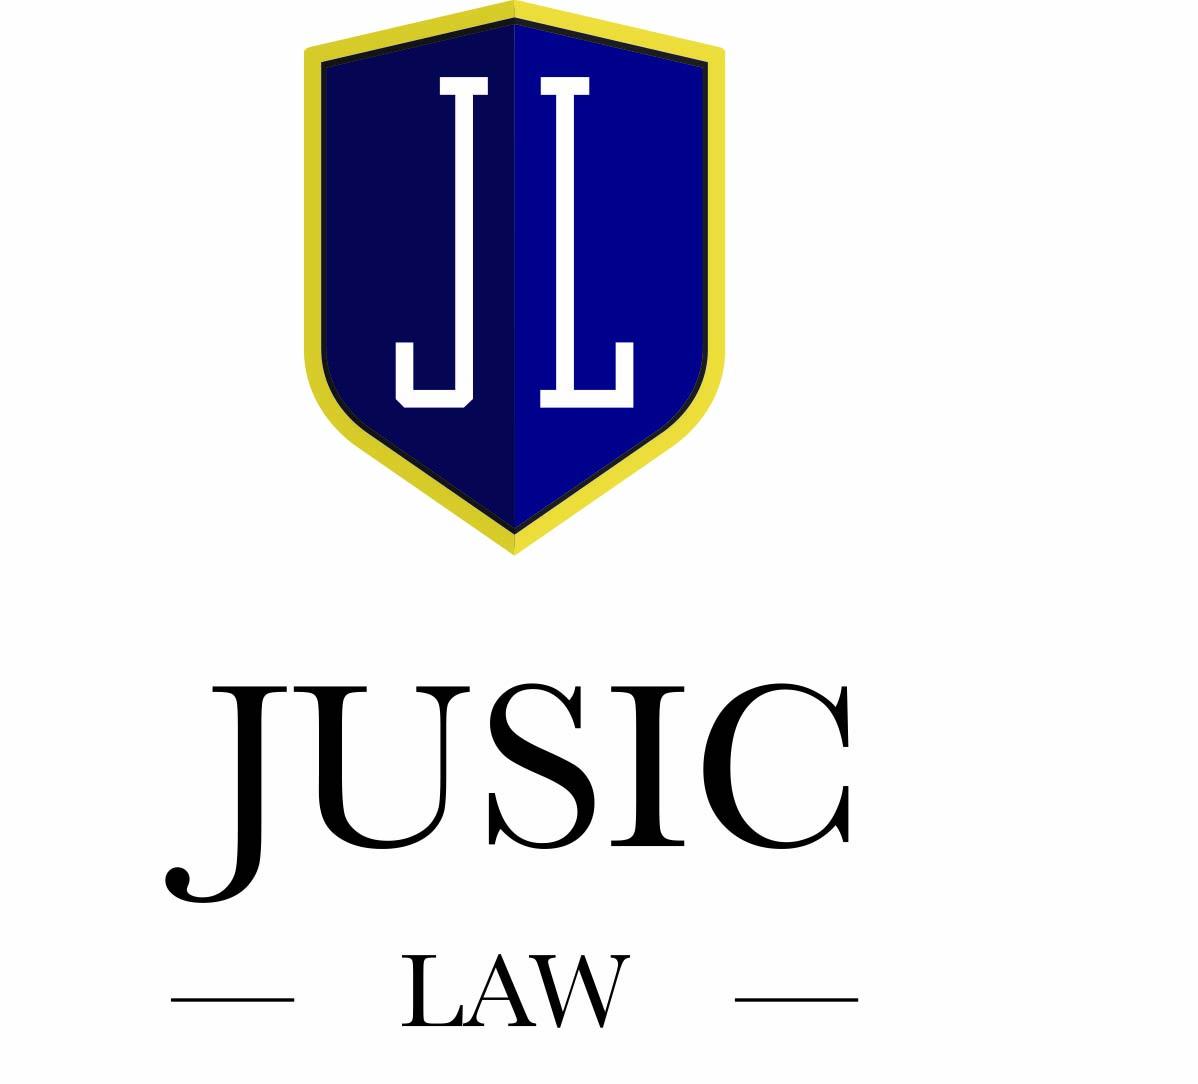 Jusic Law logo.jpg